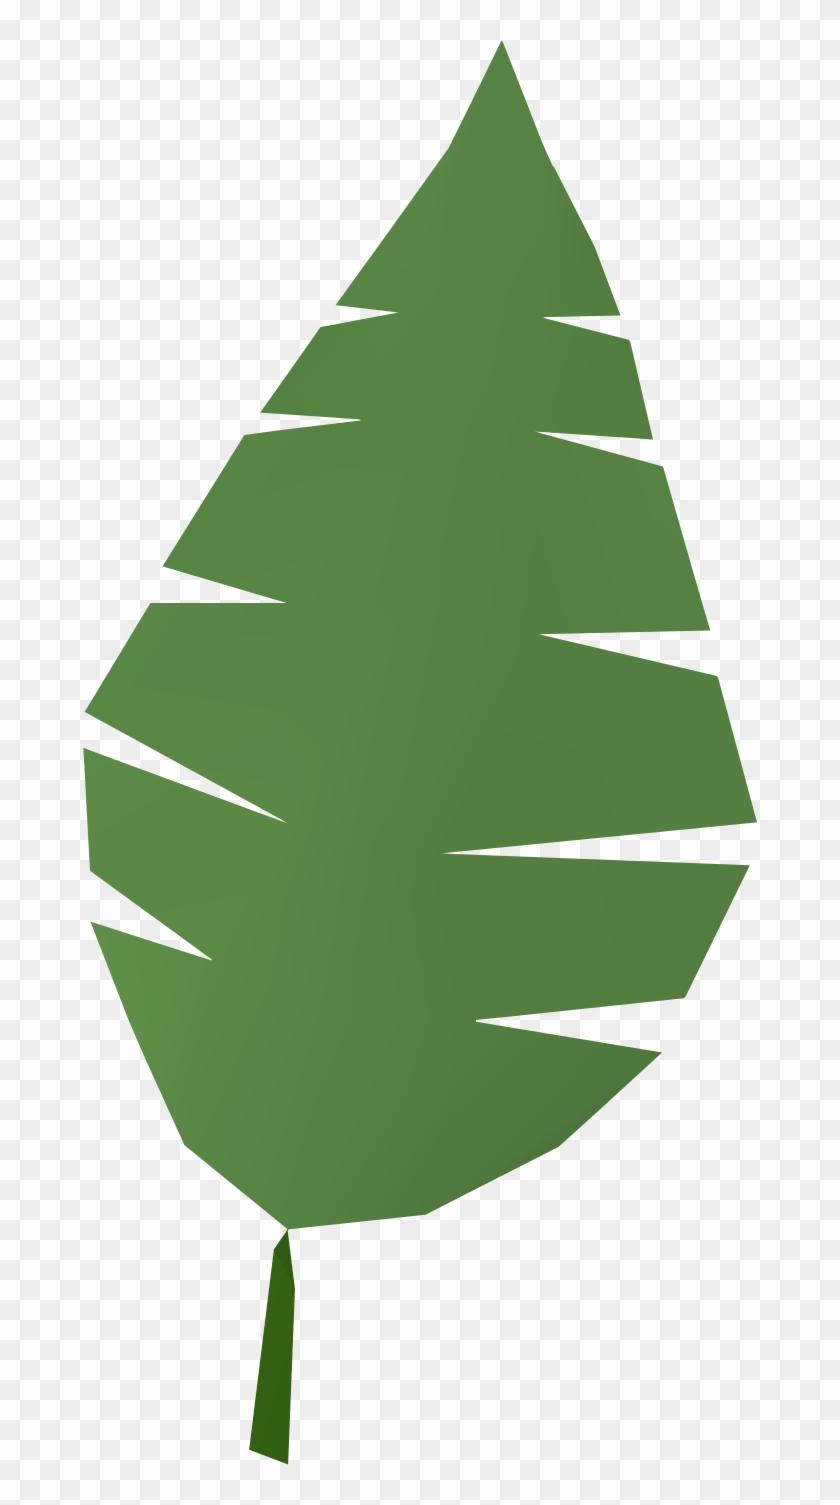 Palm Leaf Png Clip Art - Palm Leaf Png Clip Art #598